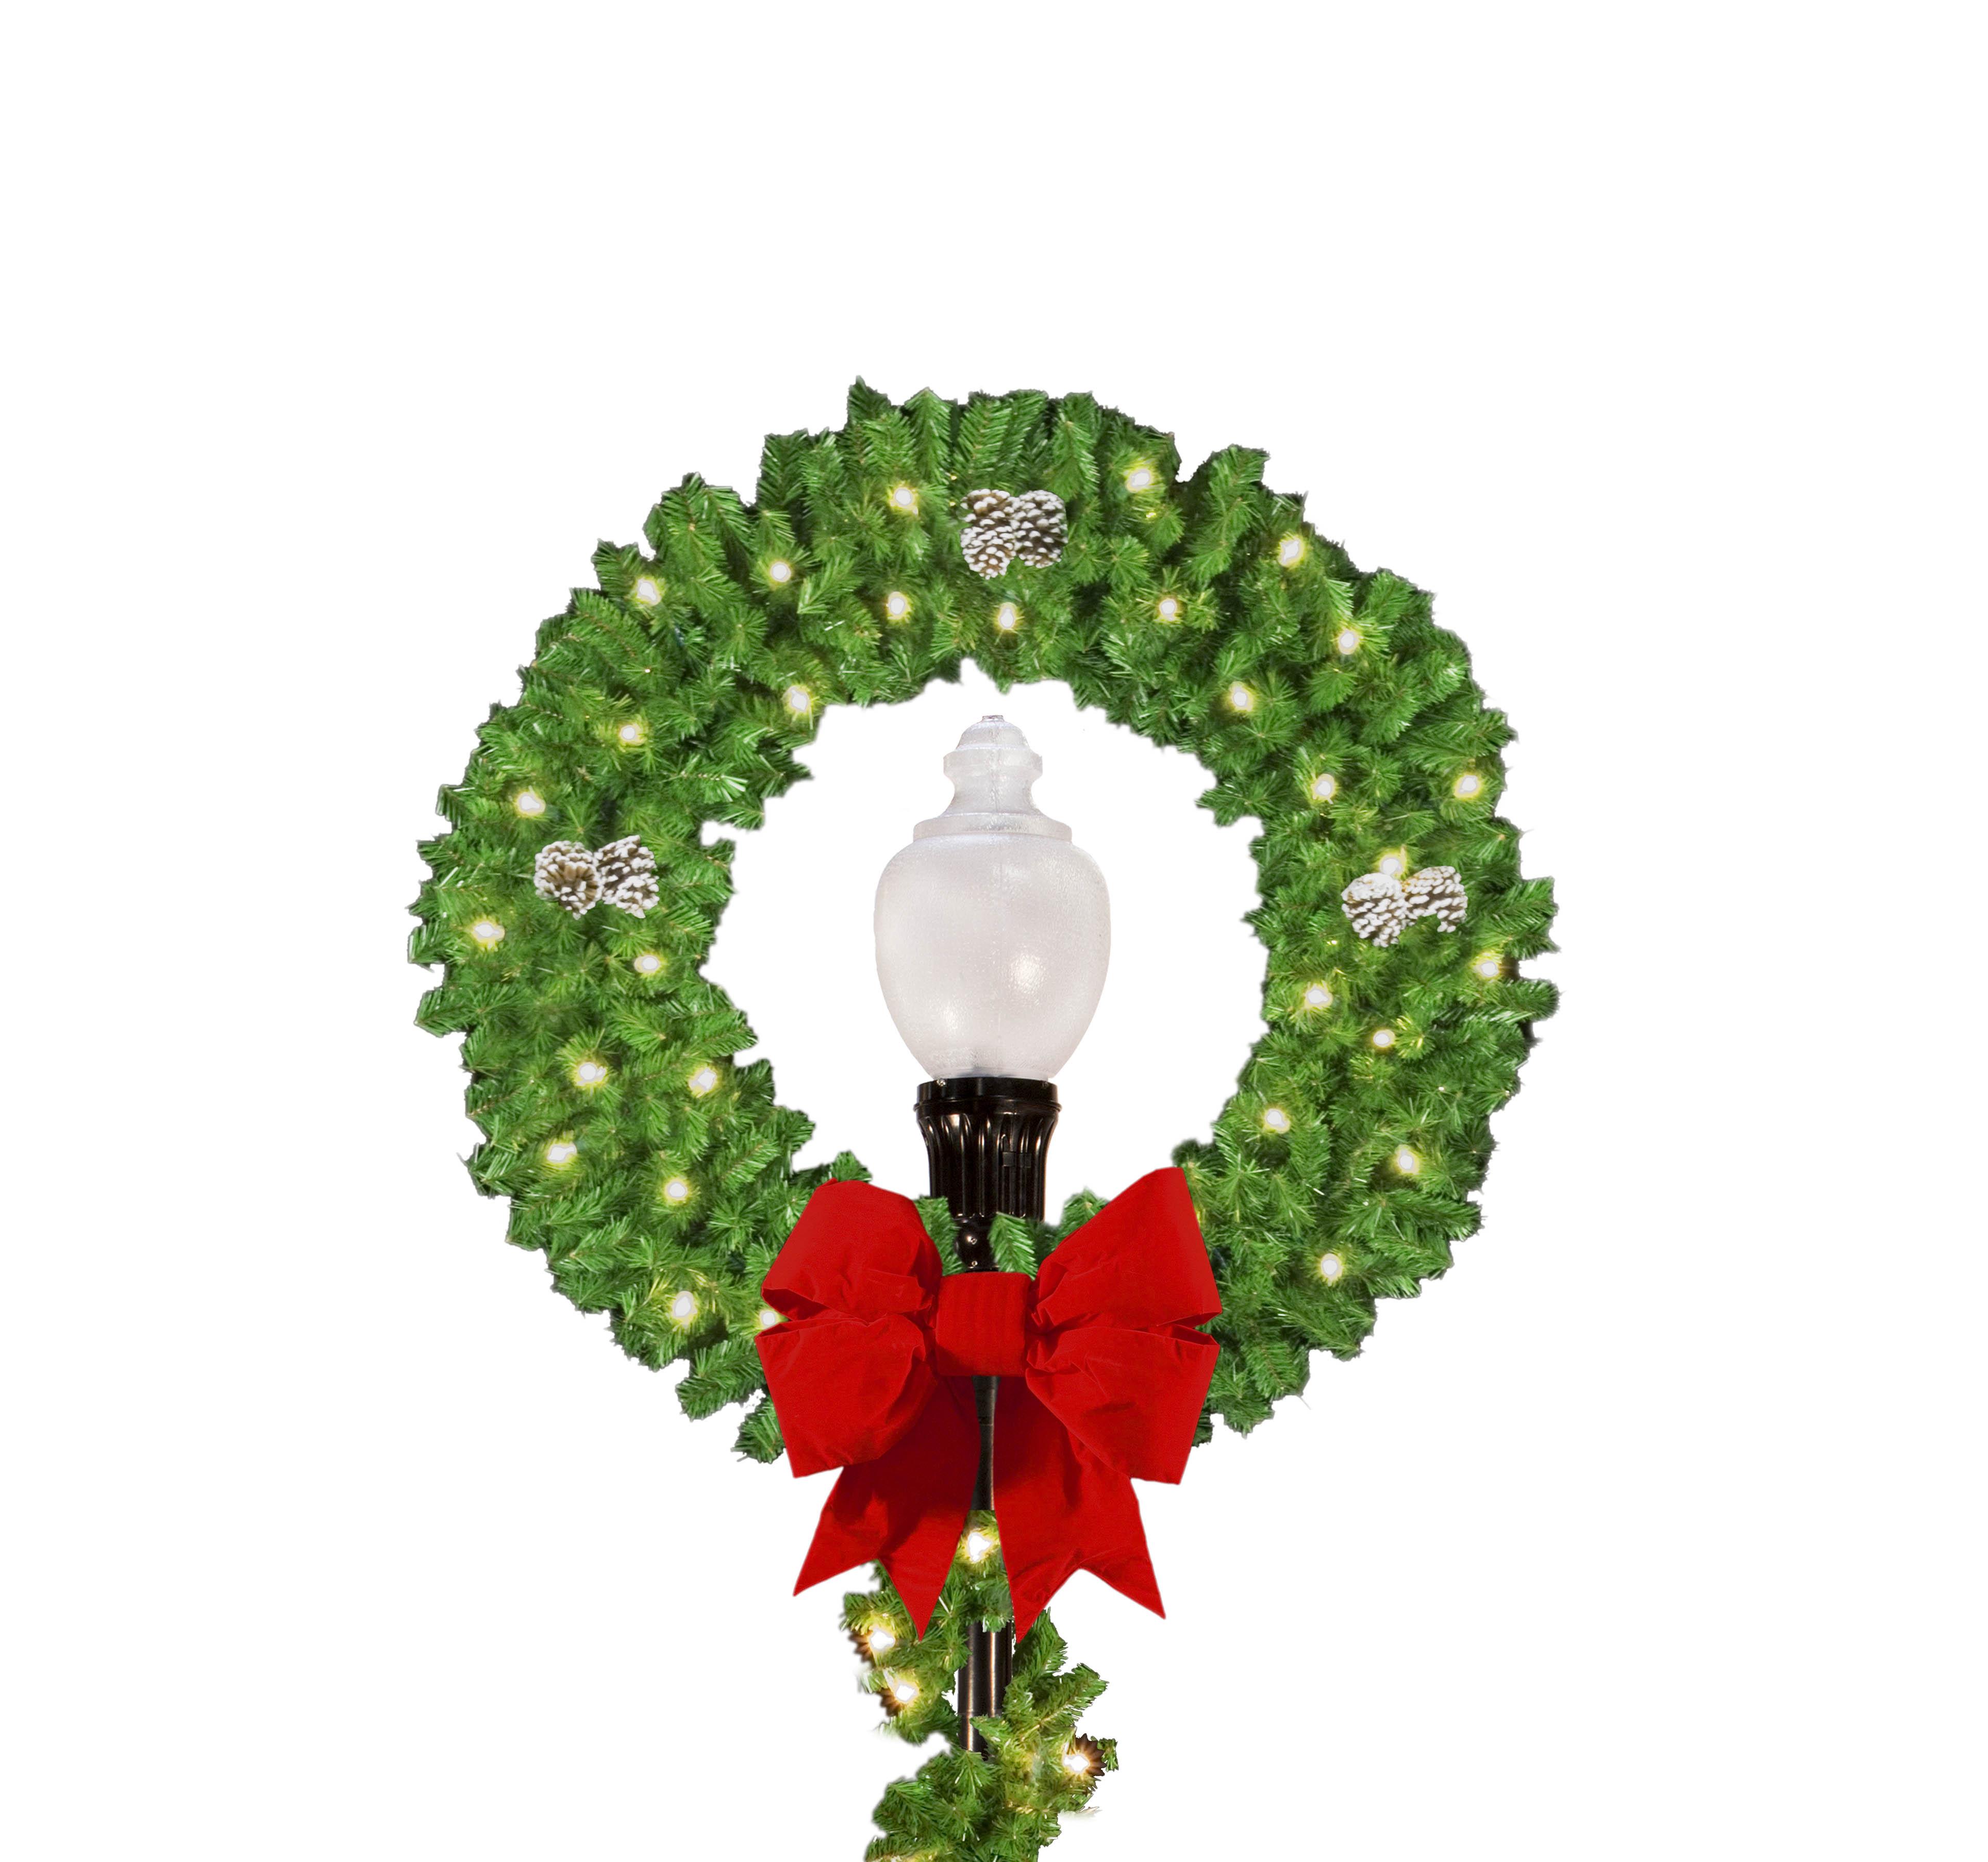 3857x3613 Wreath Light Pole Christmas Decorations